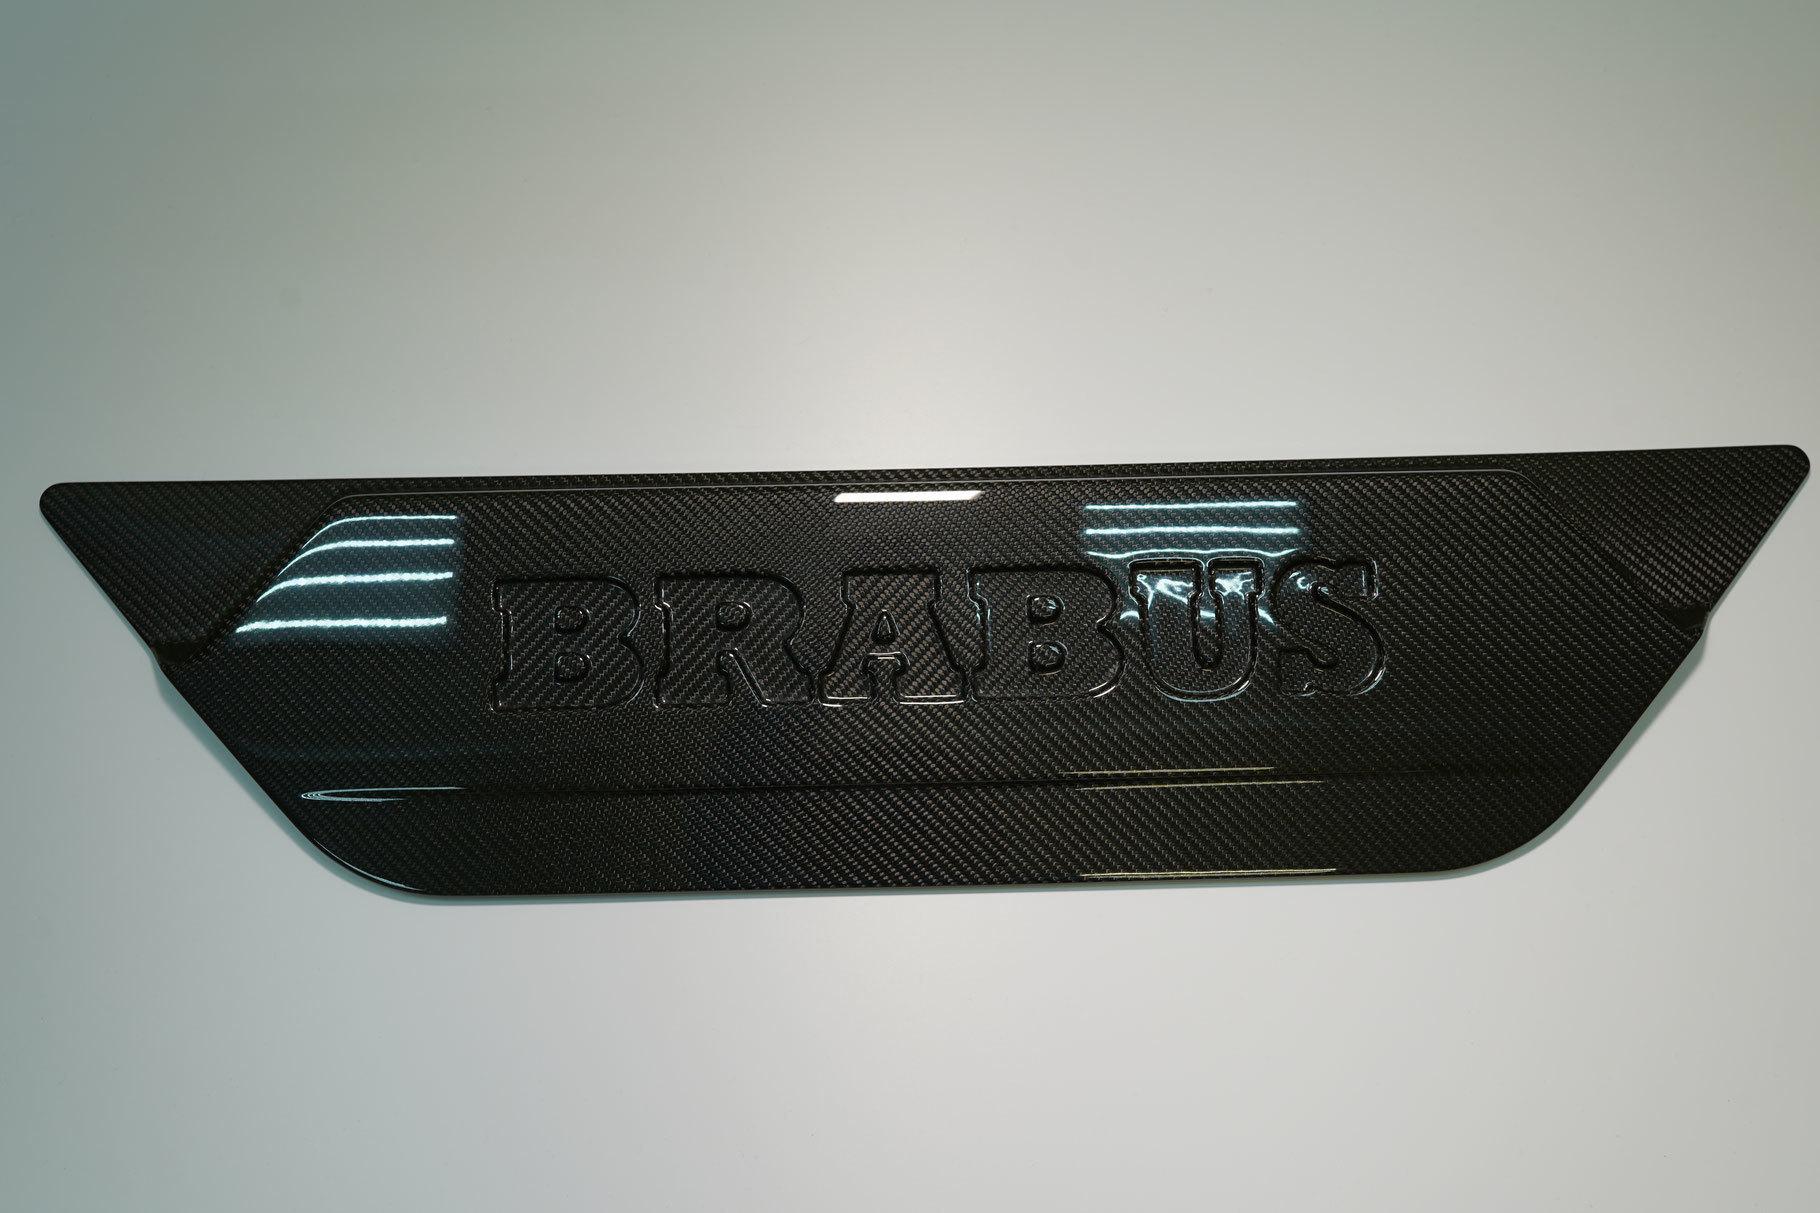 Hodoor Performance Carbon fiber Rear door cover Mercedes G-class W463A